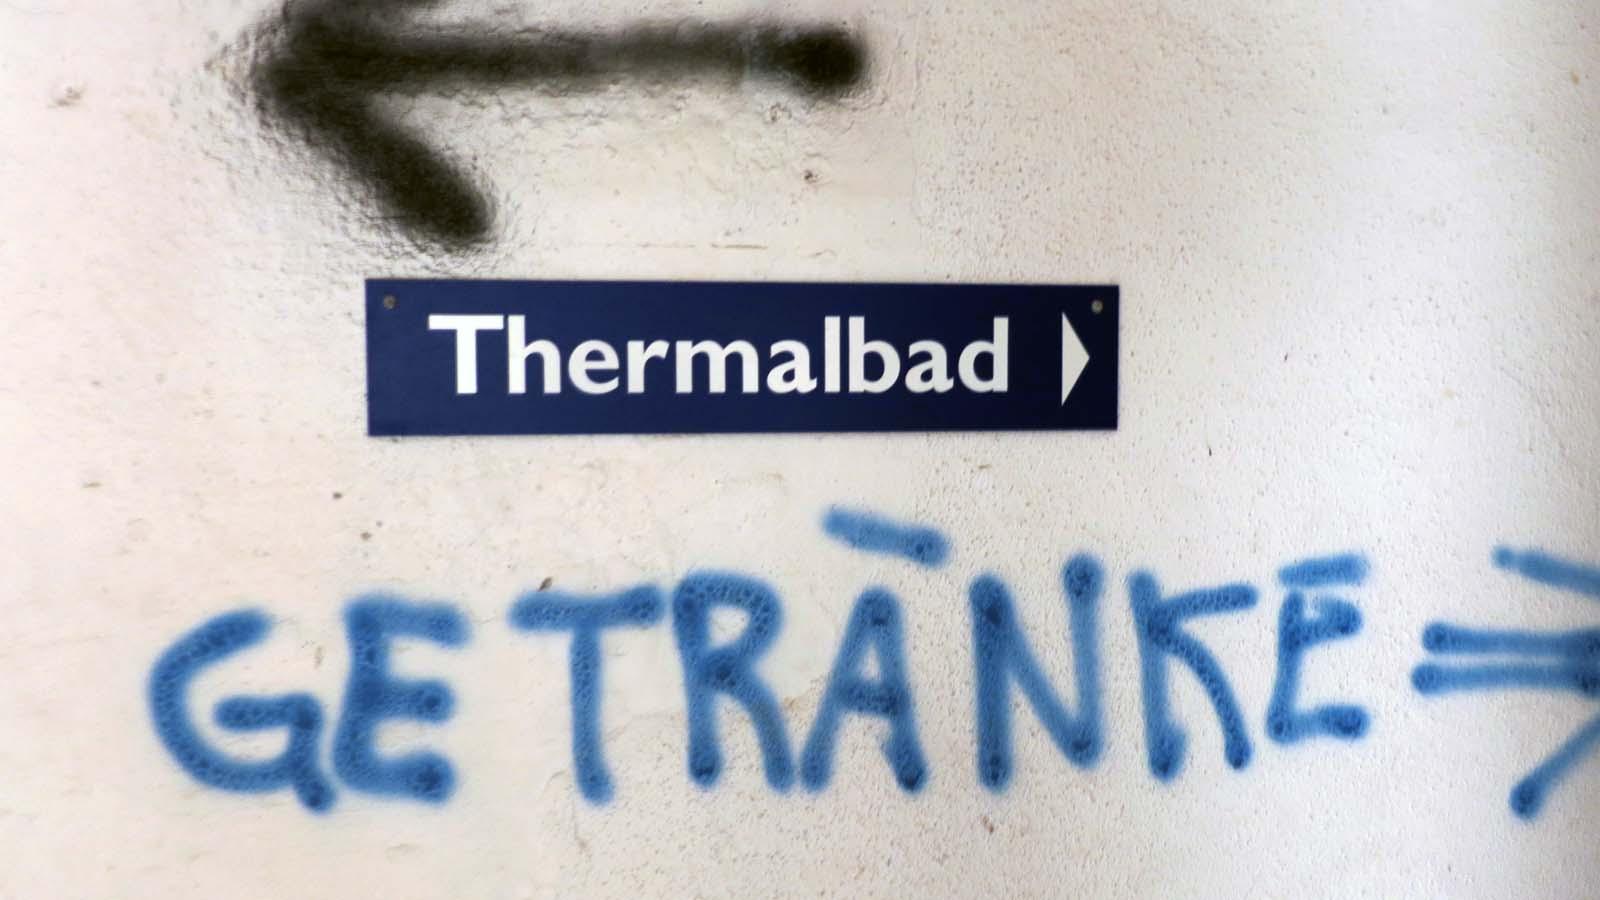 thermalbad-getraenke-pano.jpg